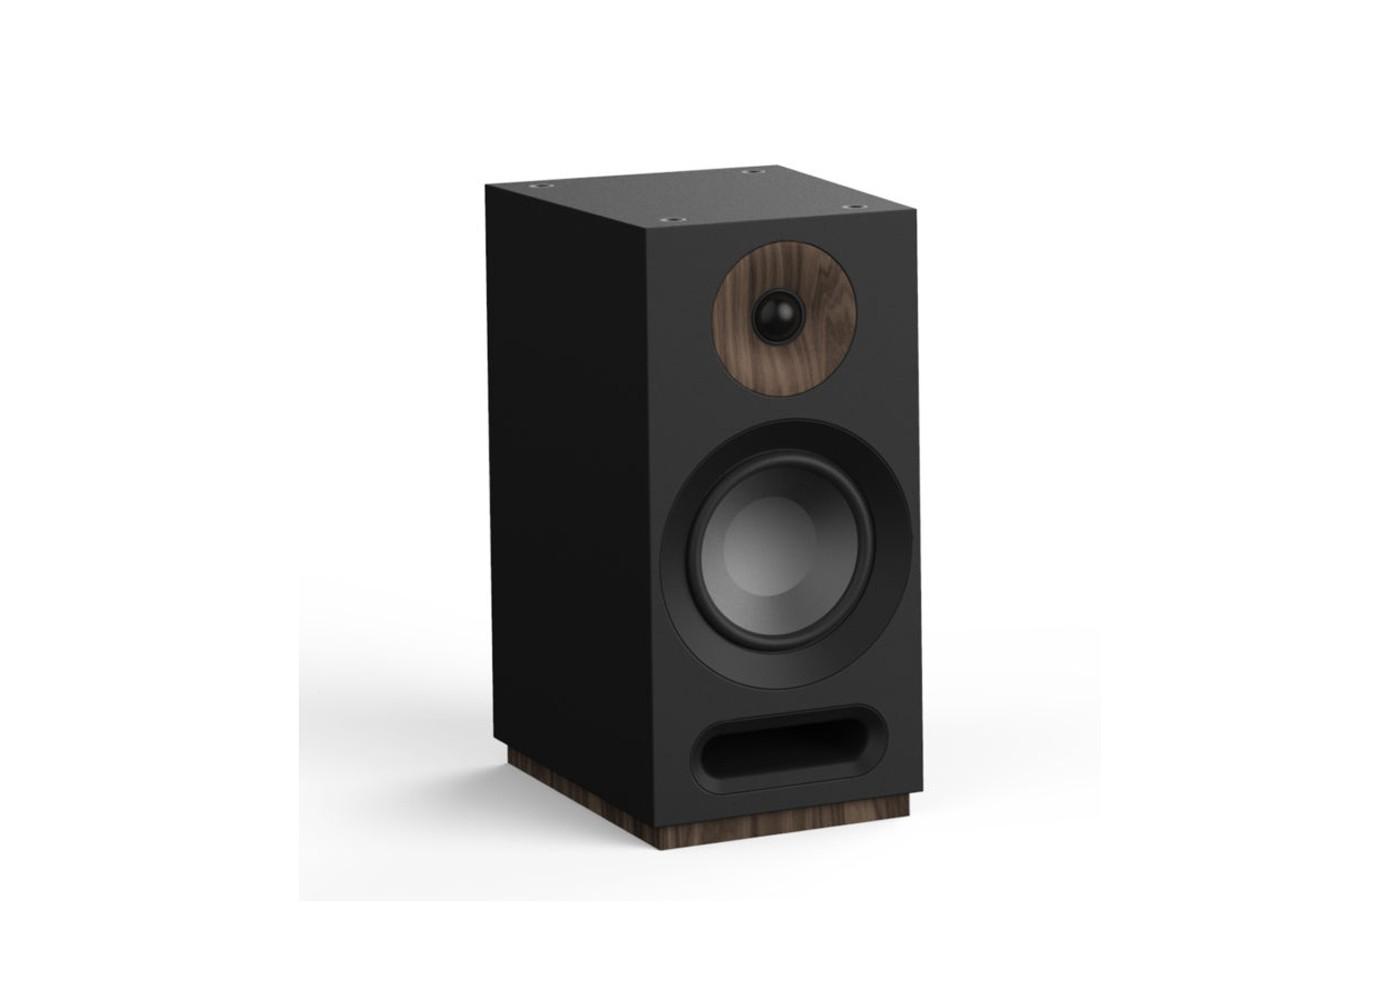 Jamo Studio Series S 803 BLK Black Bookshelf Speakers